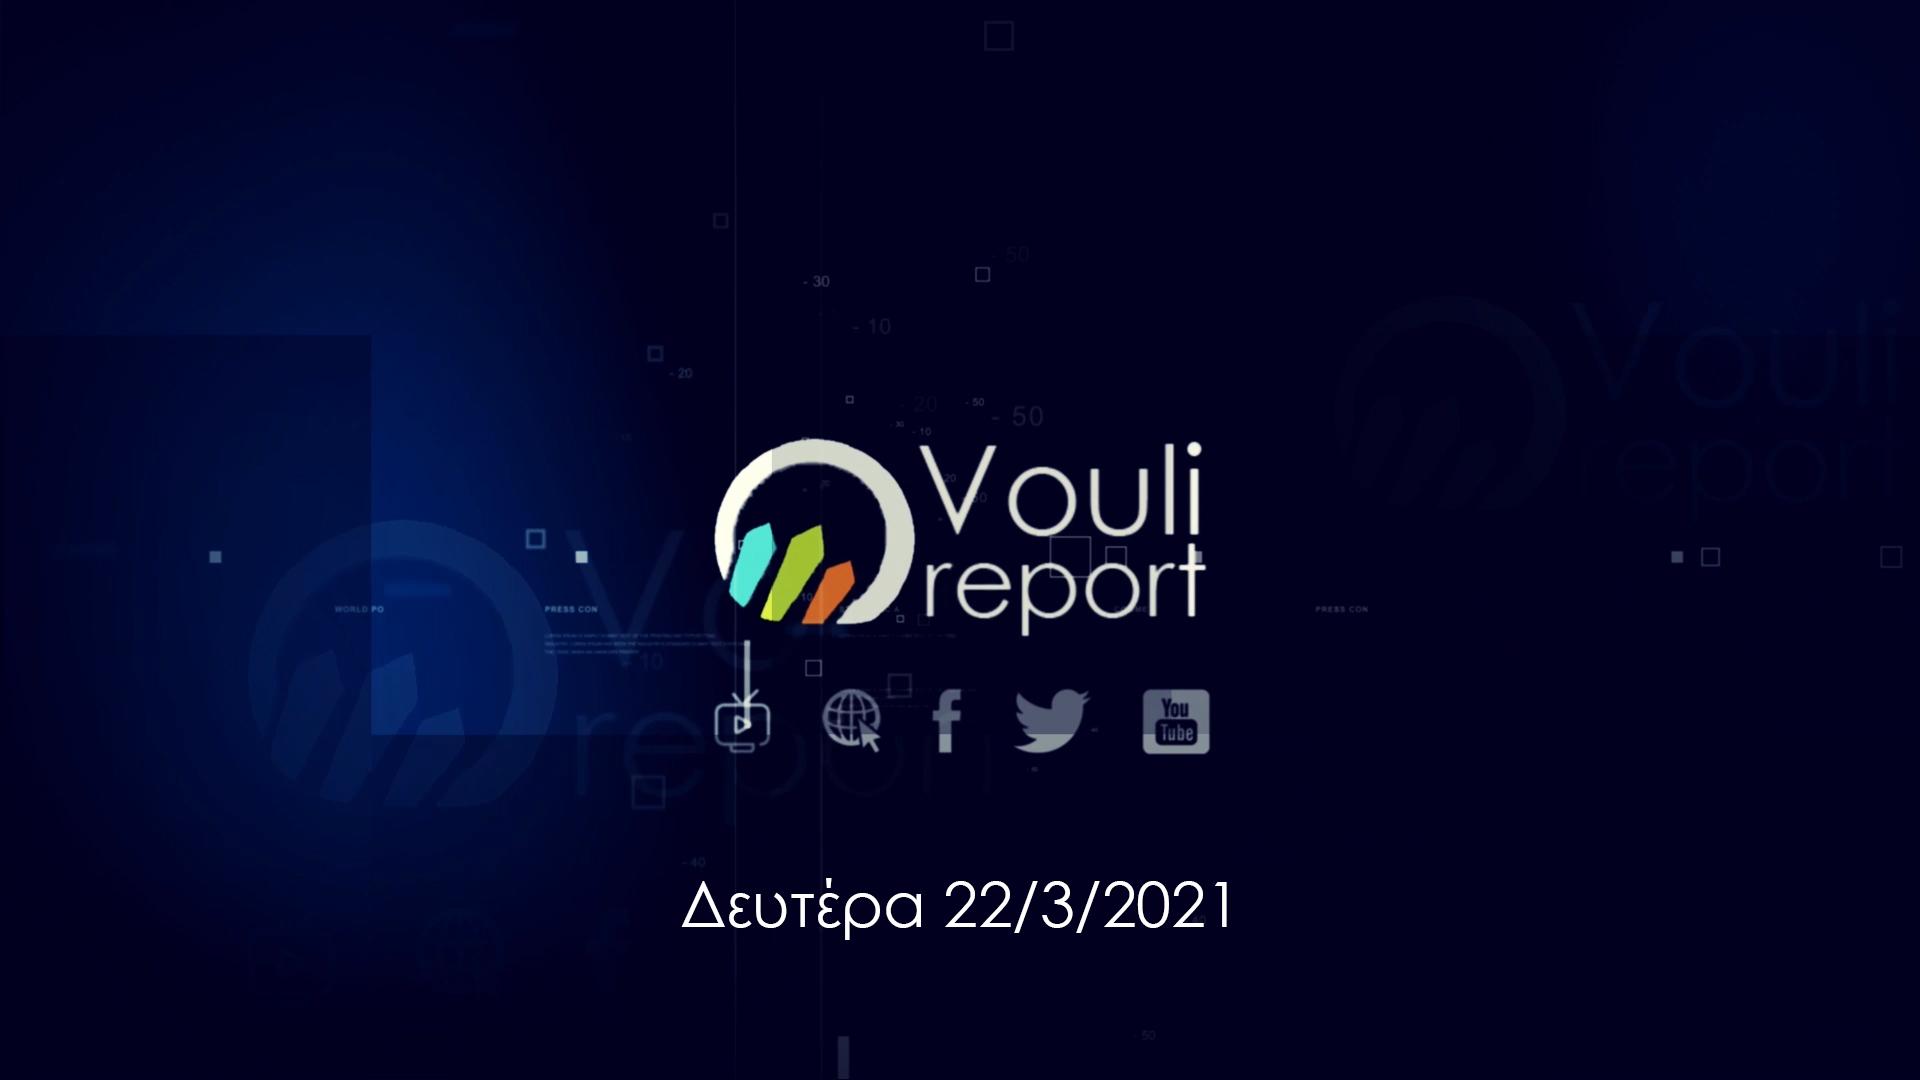 Vouli report | 22/03/2021